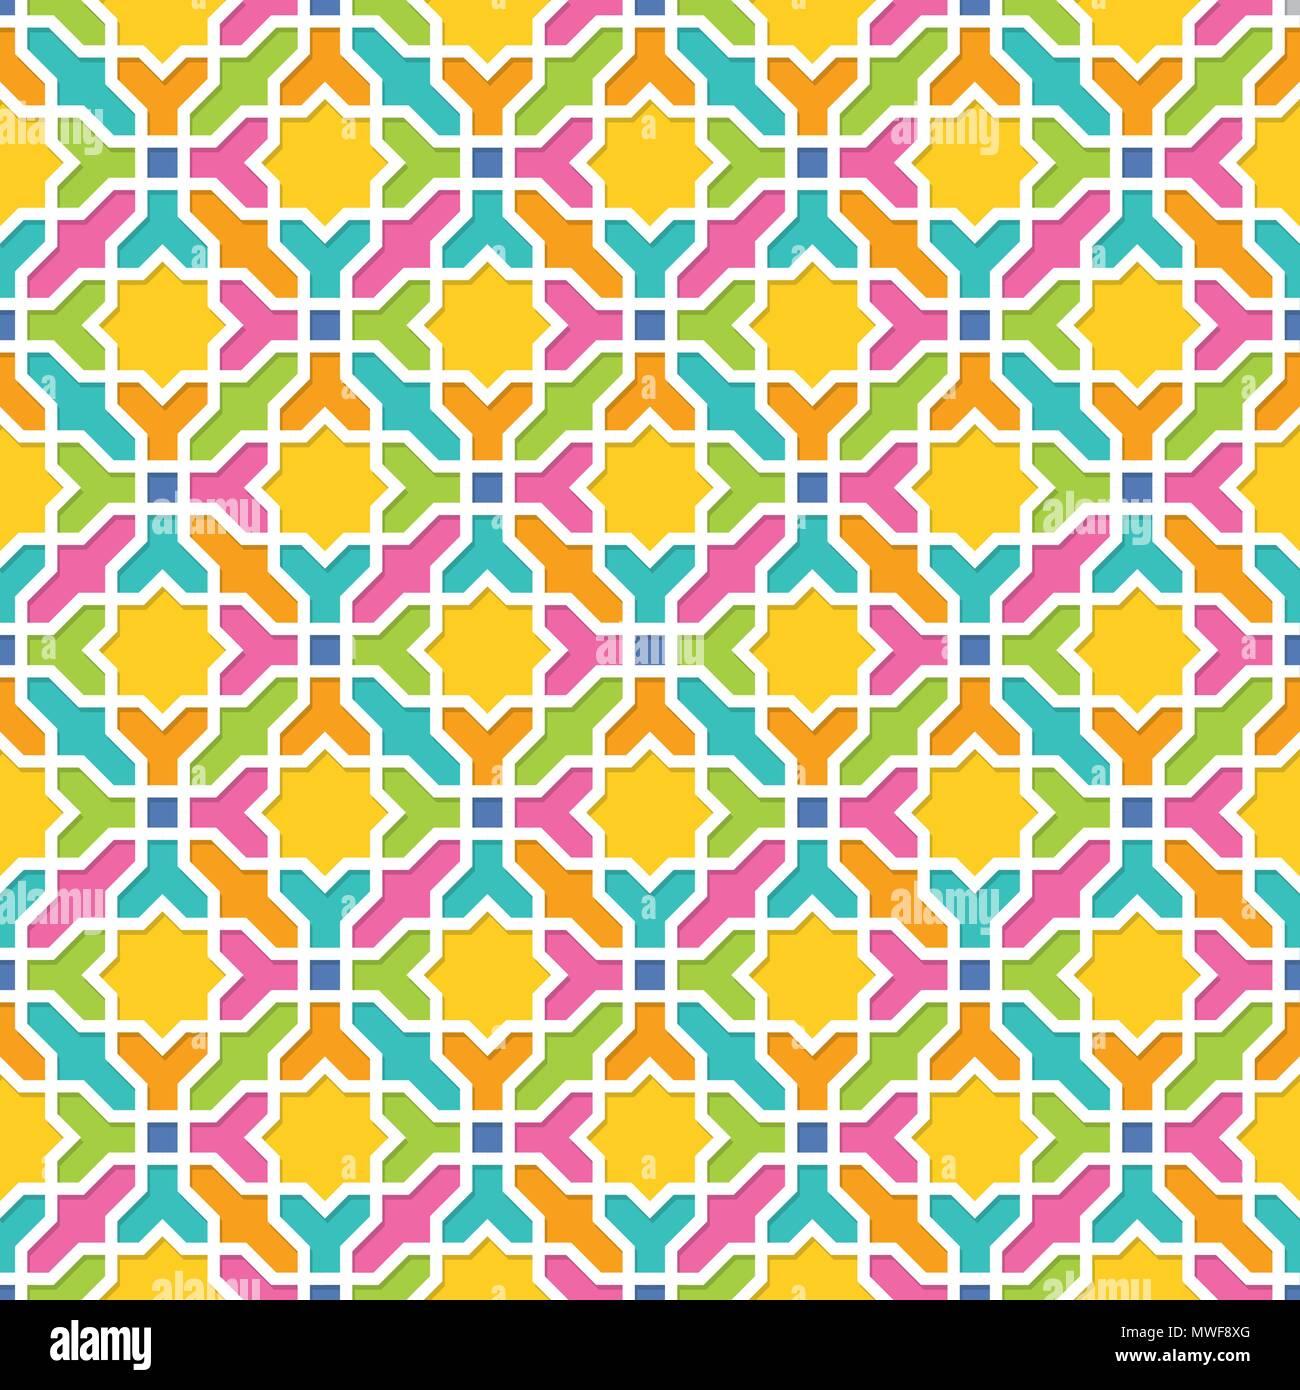 Geometric pattern in Arabian style, Seamless vector background